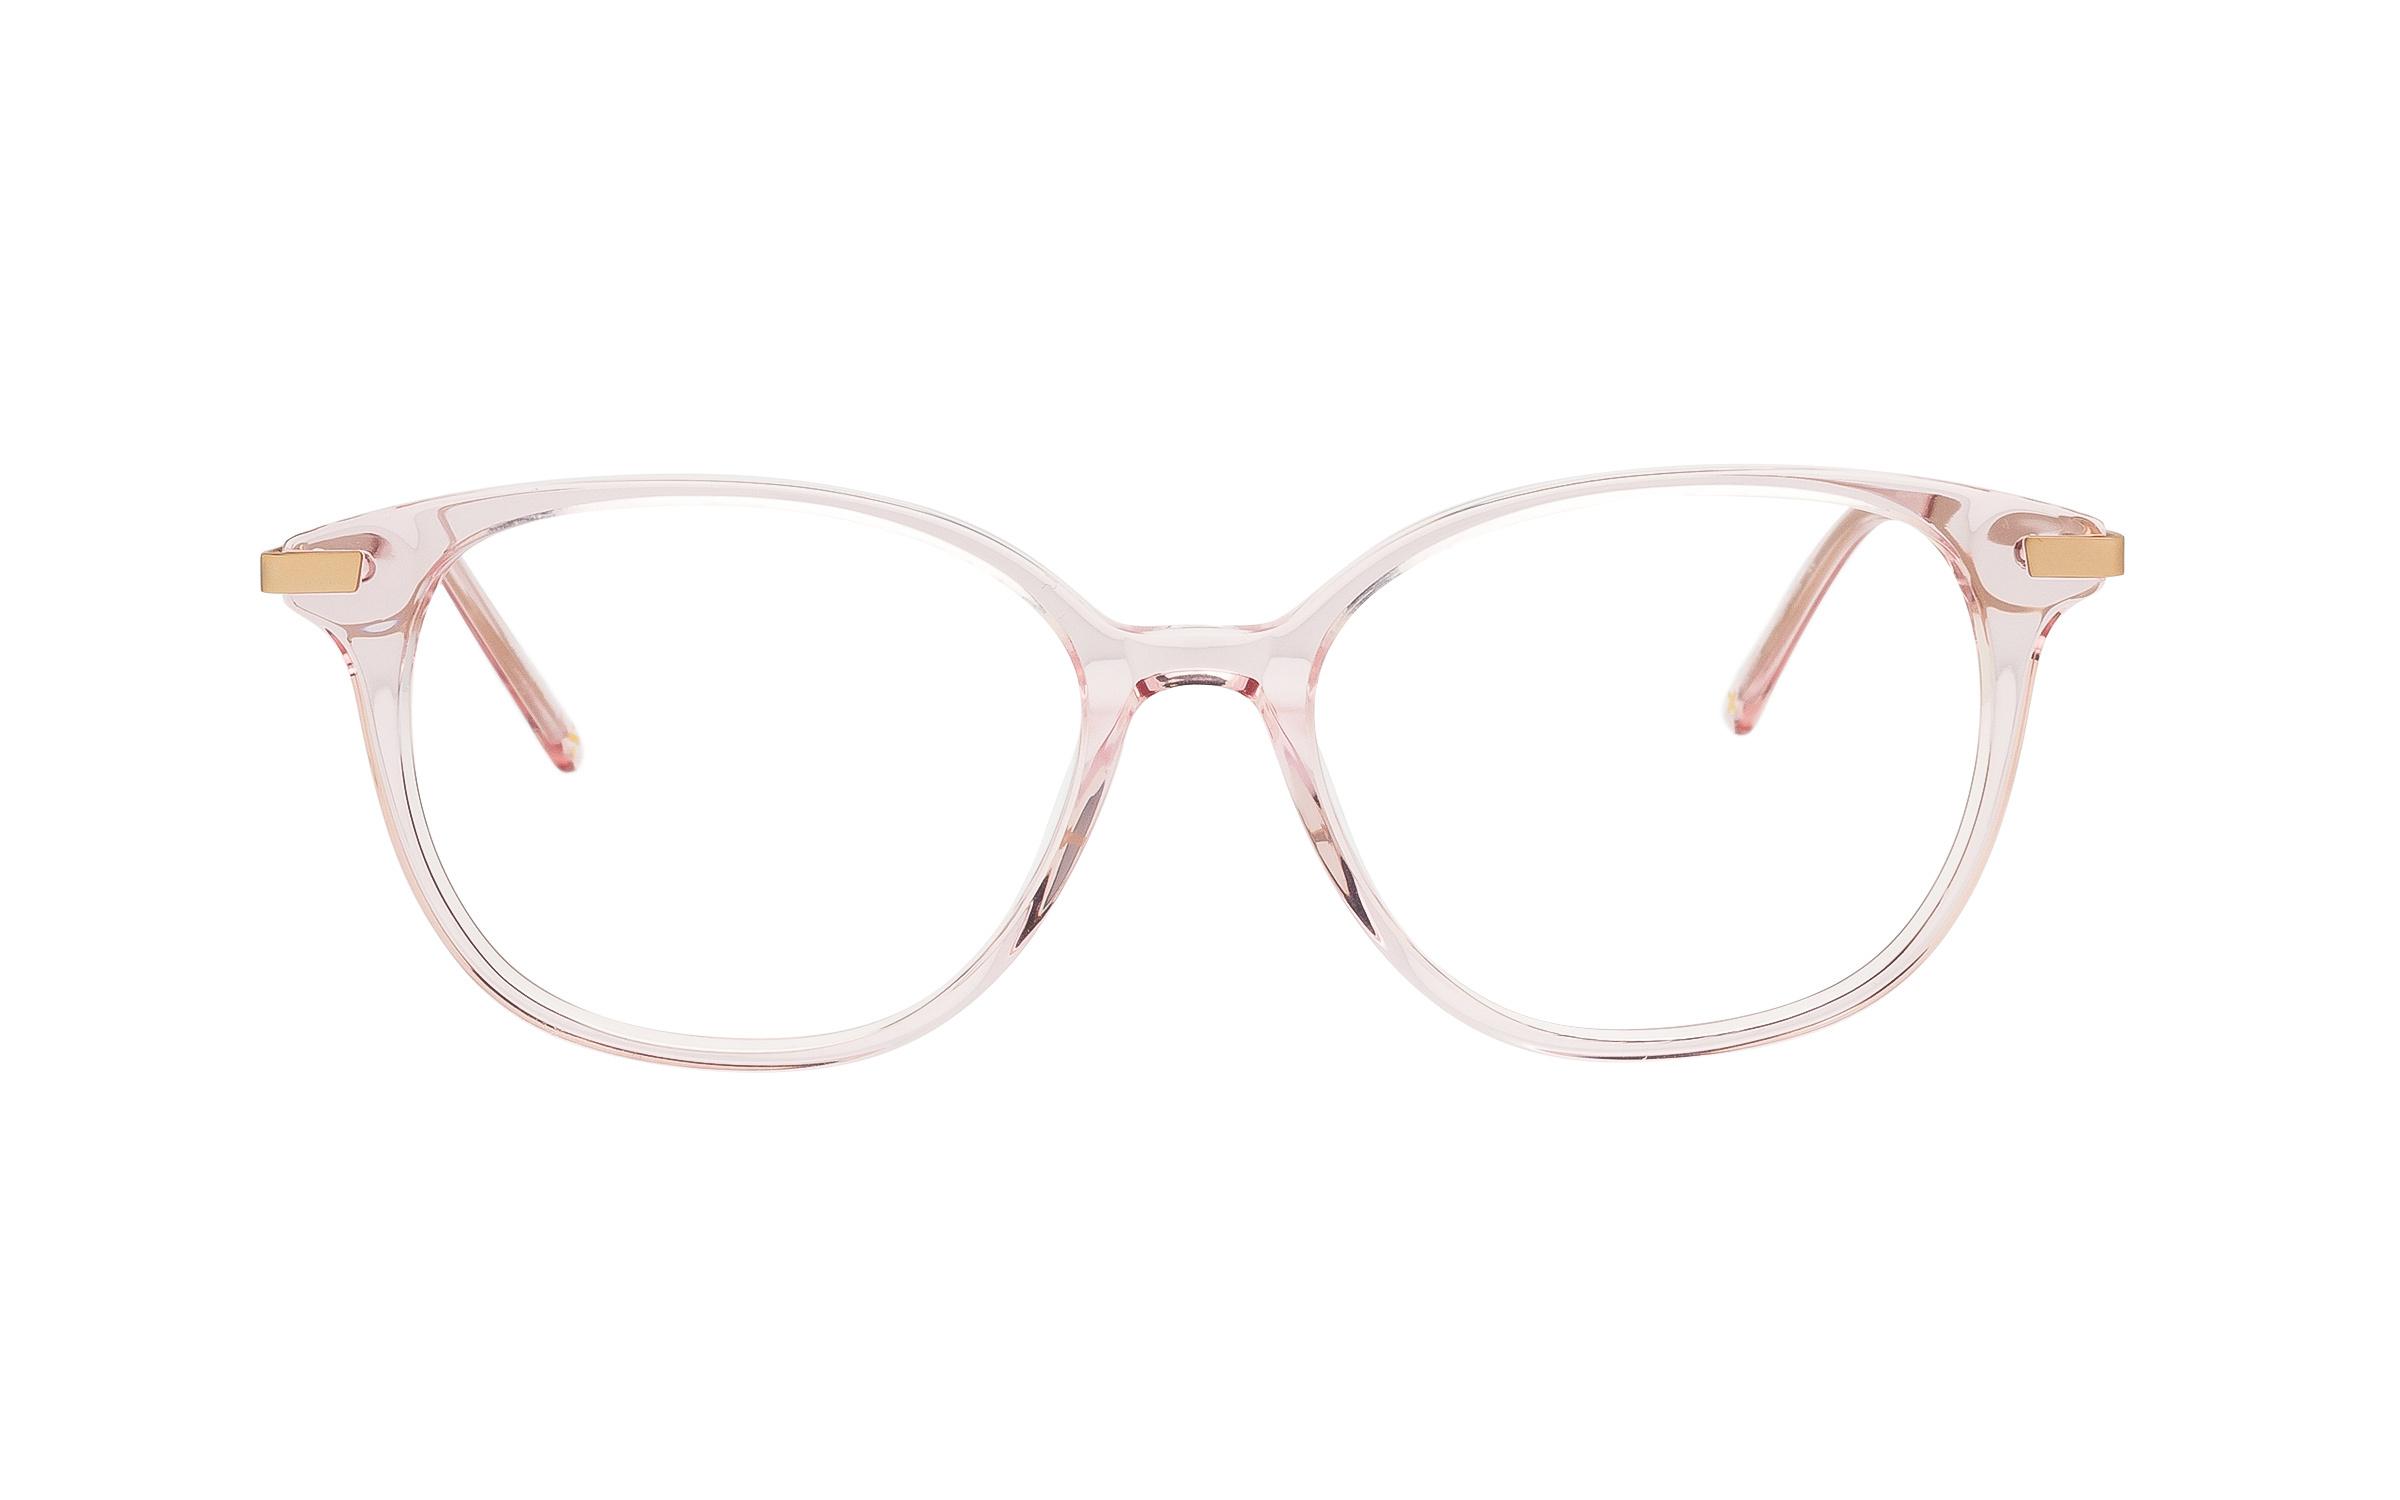 coastal.com - Derek Cardigan Kari (53) Eyeglasses and Frame in Pink | Acetate/Metal – Online Coastal 55.00 USD